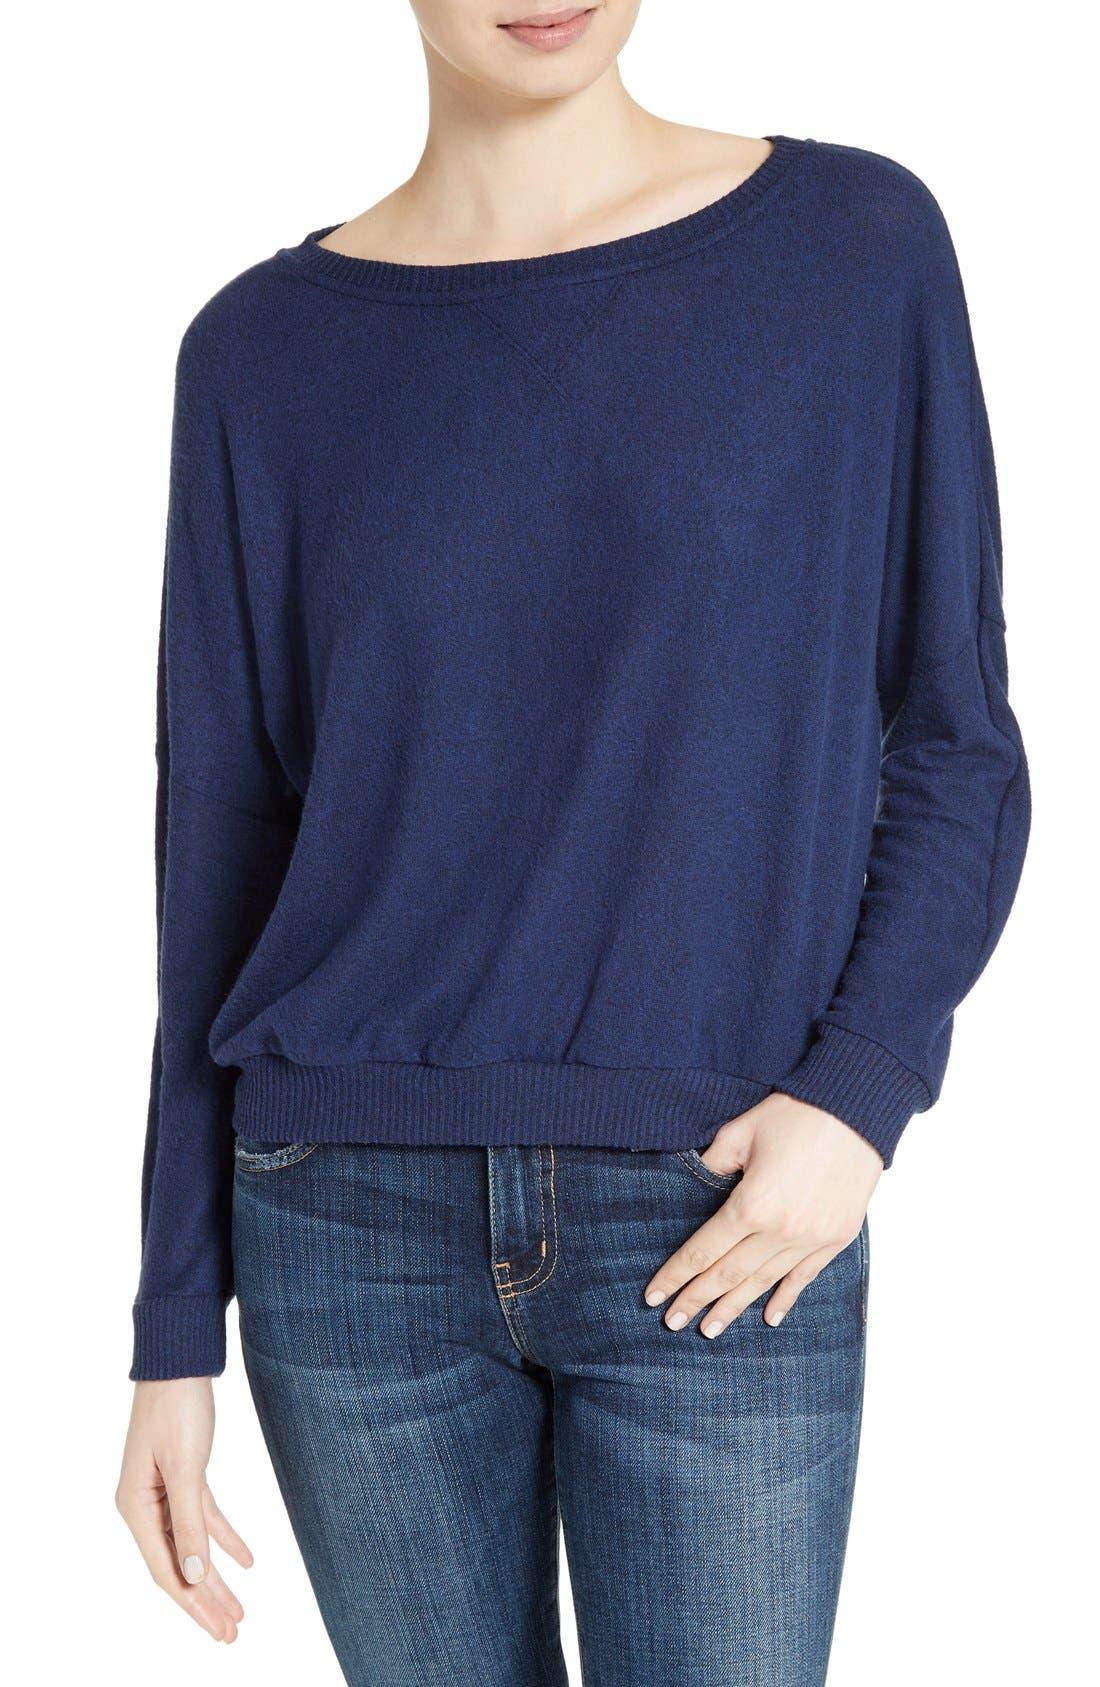 Soft Joie Giardia Drop Shoulder Sweater,                         Main,                         color, Peacoat